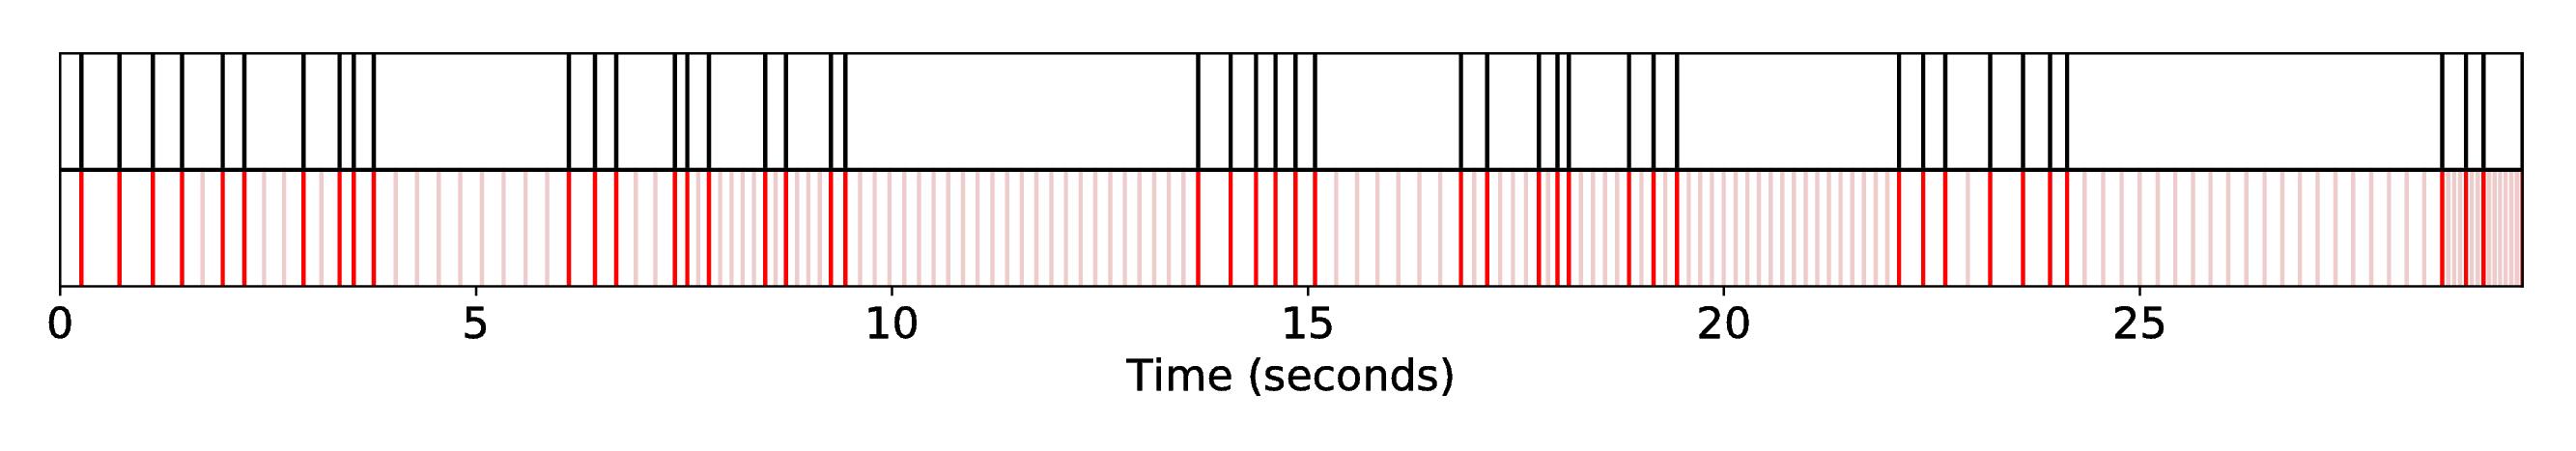 DP1_INT1_R-Syn-RaGa__S-Broke__SequenceAlignment